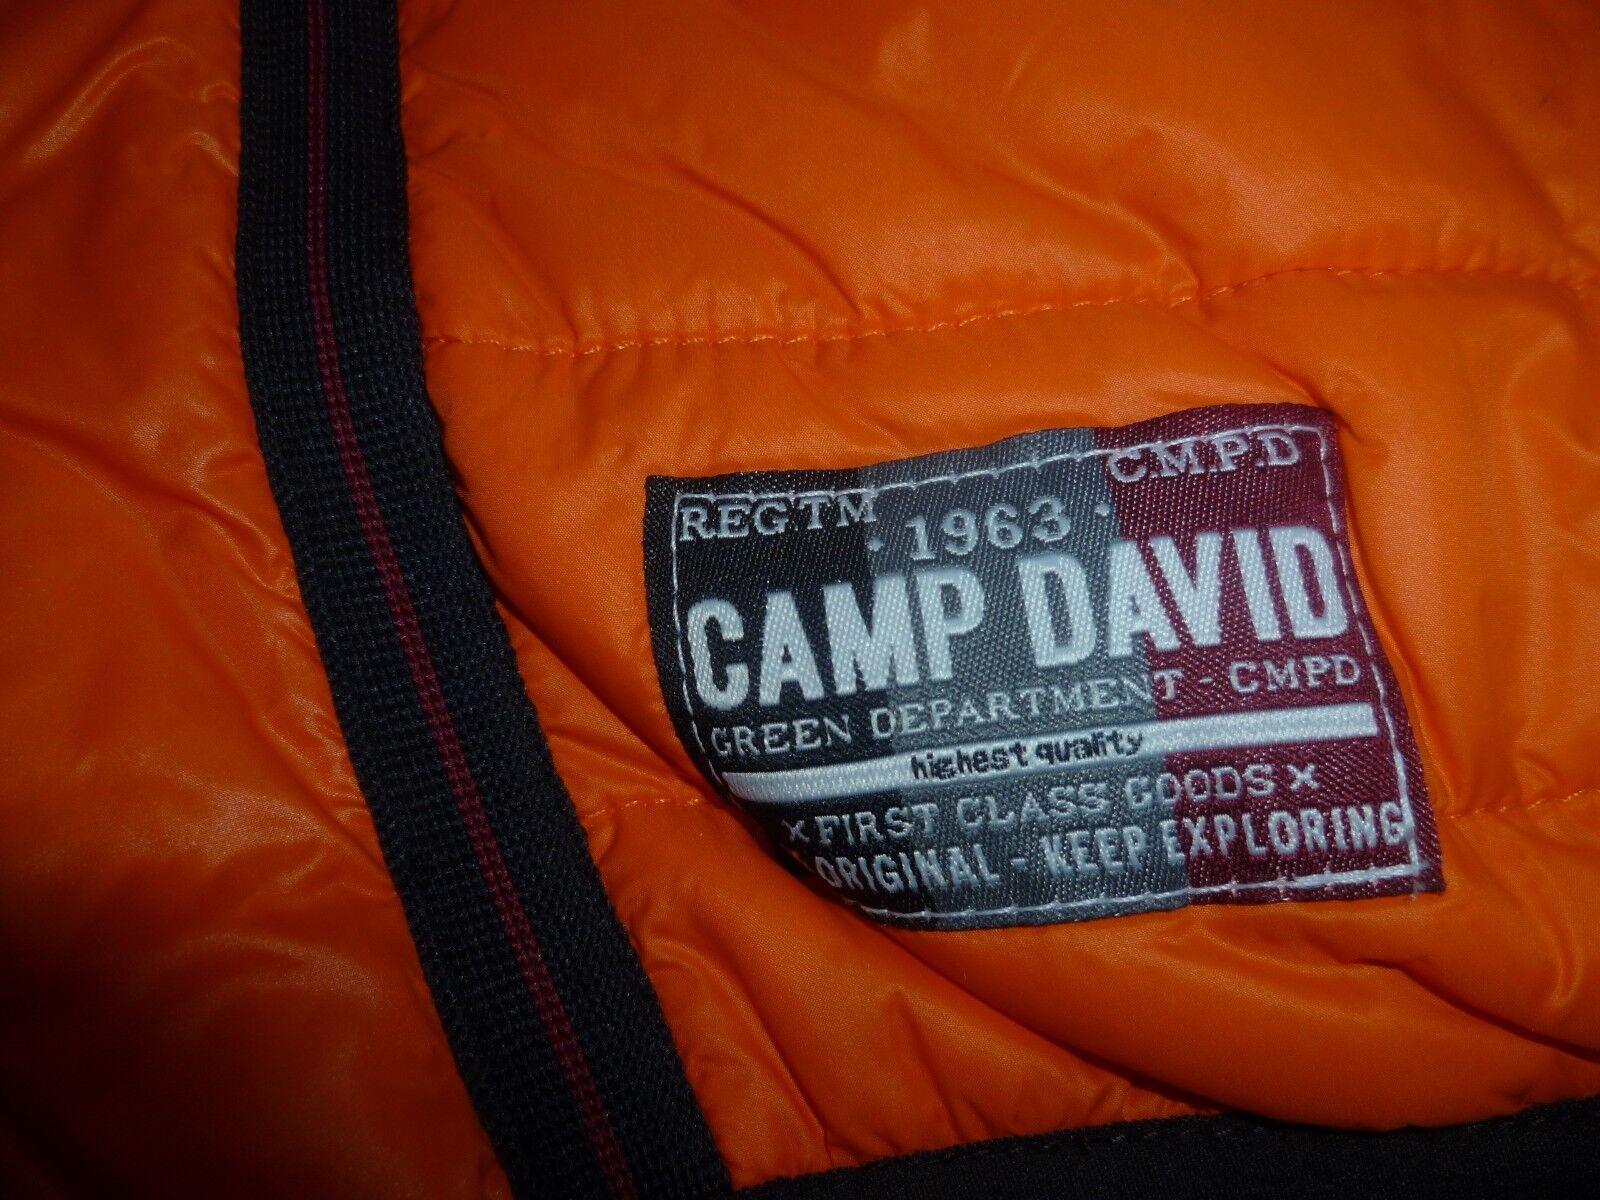 TOP NEU Herren Männer Outdoor Weste Steppweste mit Kapuze Kapuze Kapuze Orange CAMP DAVID Gr.M 544480